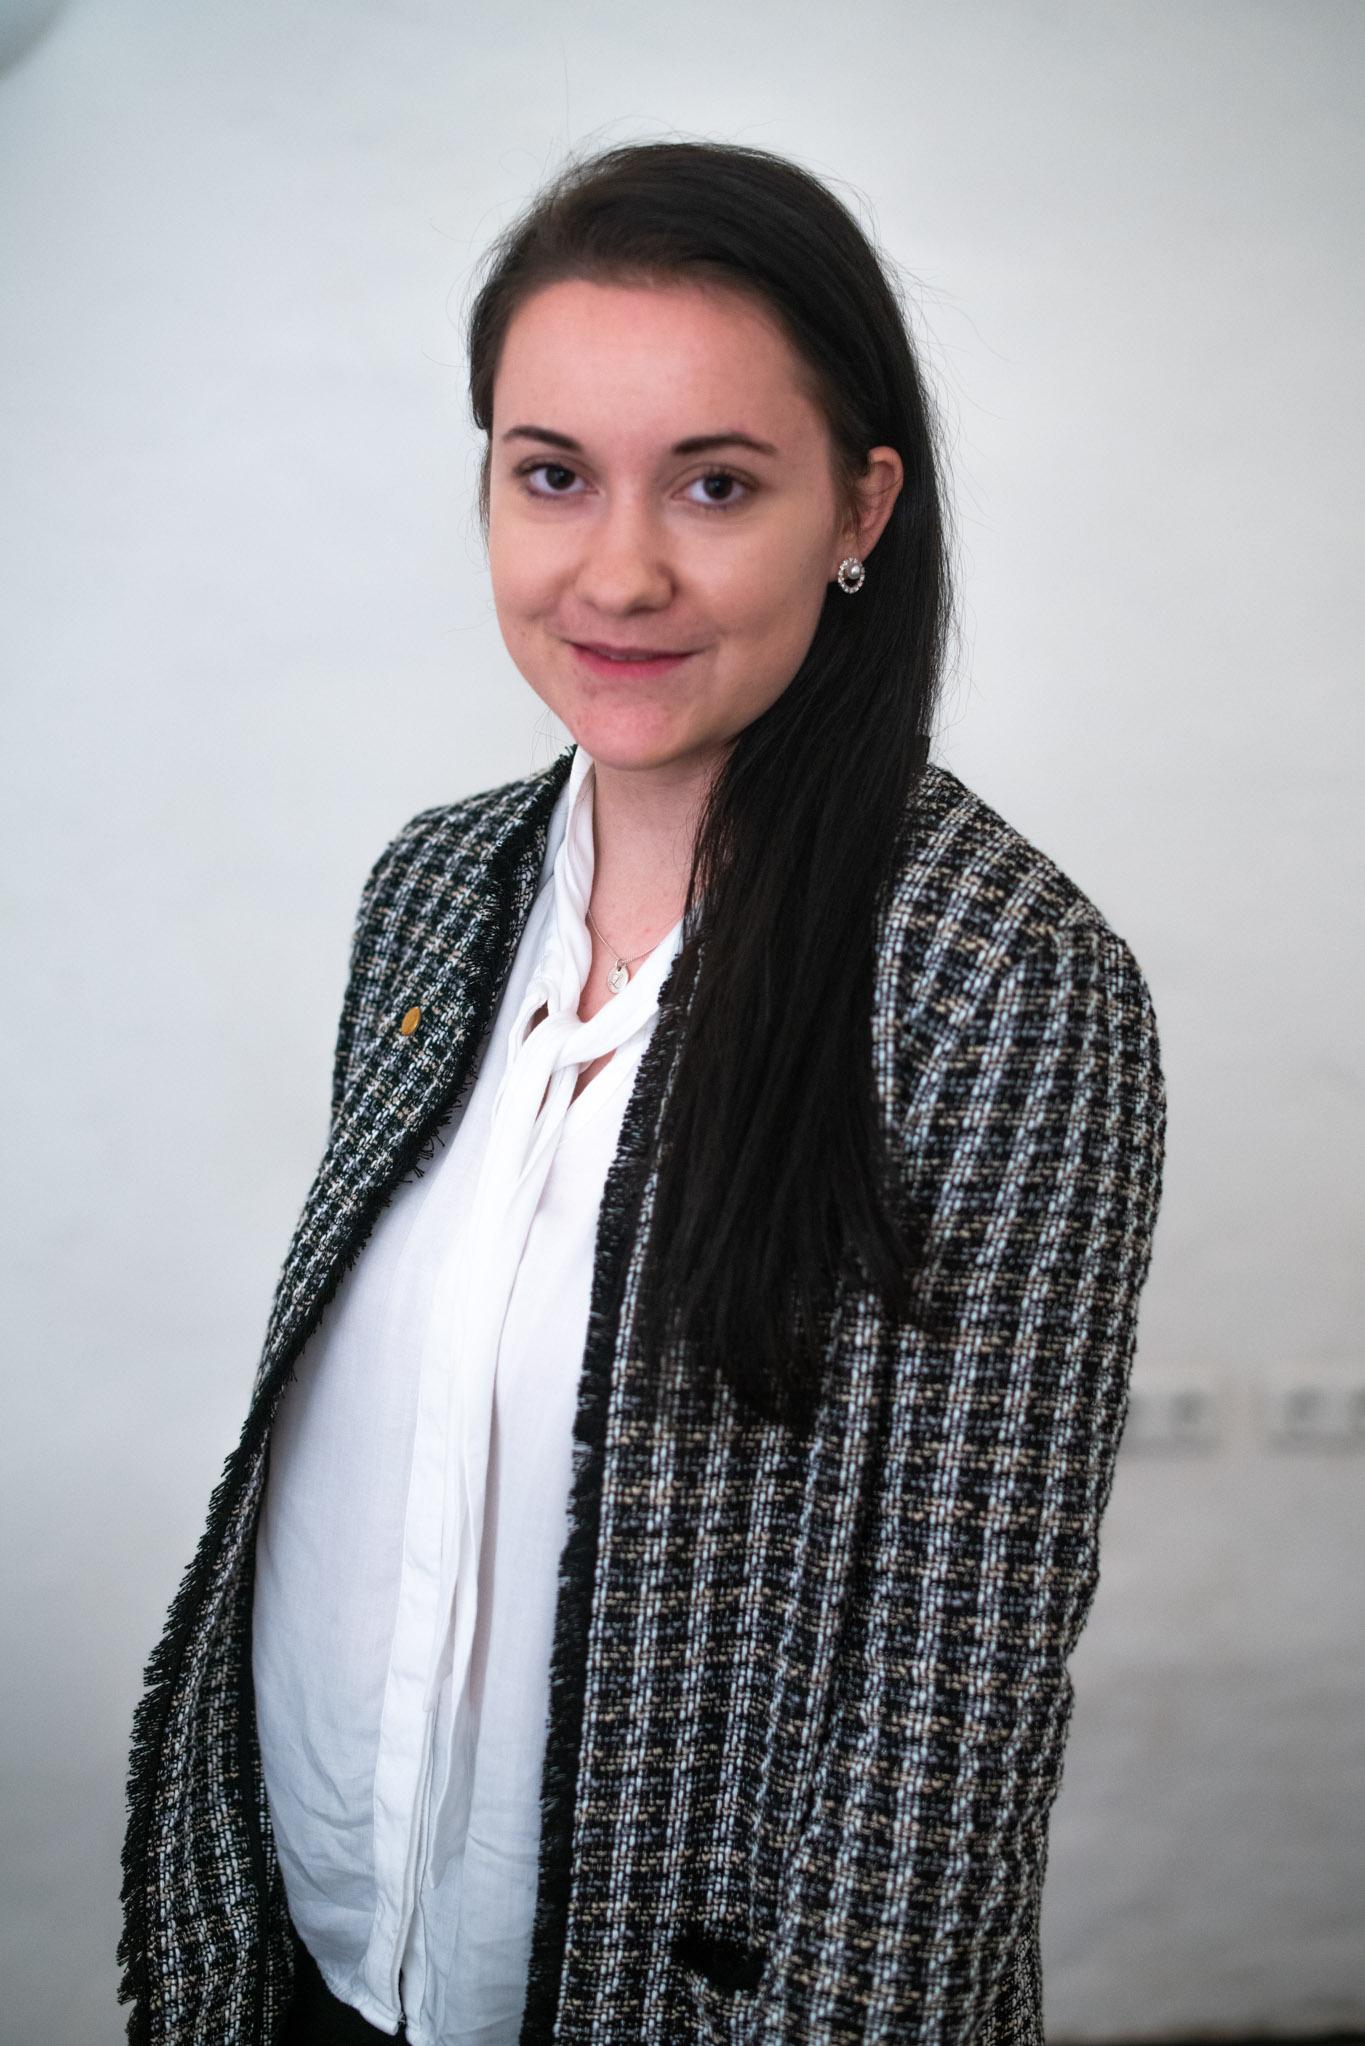 Laura Zettl